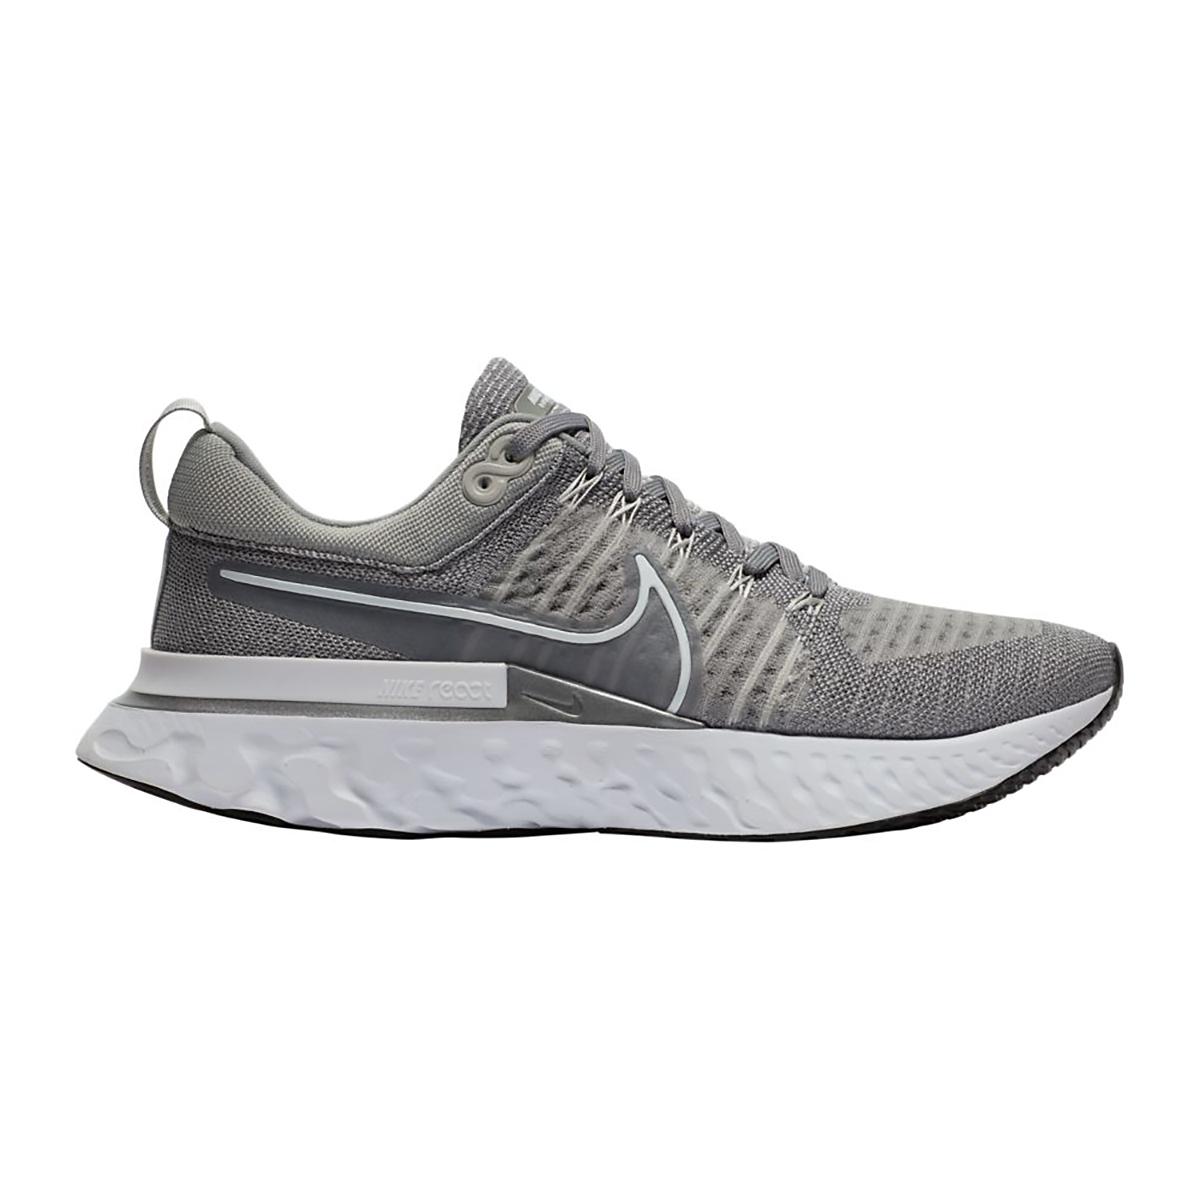 Men's Nike React Infinity Run Flyknit 2 Running Shoe - Color: Particle Grey/White/Grey Fog/Black - Size: 7.5 - Width: Regular, Particle Grey/White/Grey Fog/Black, large, image 1